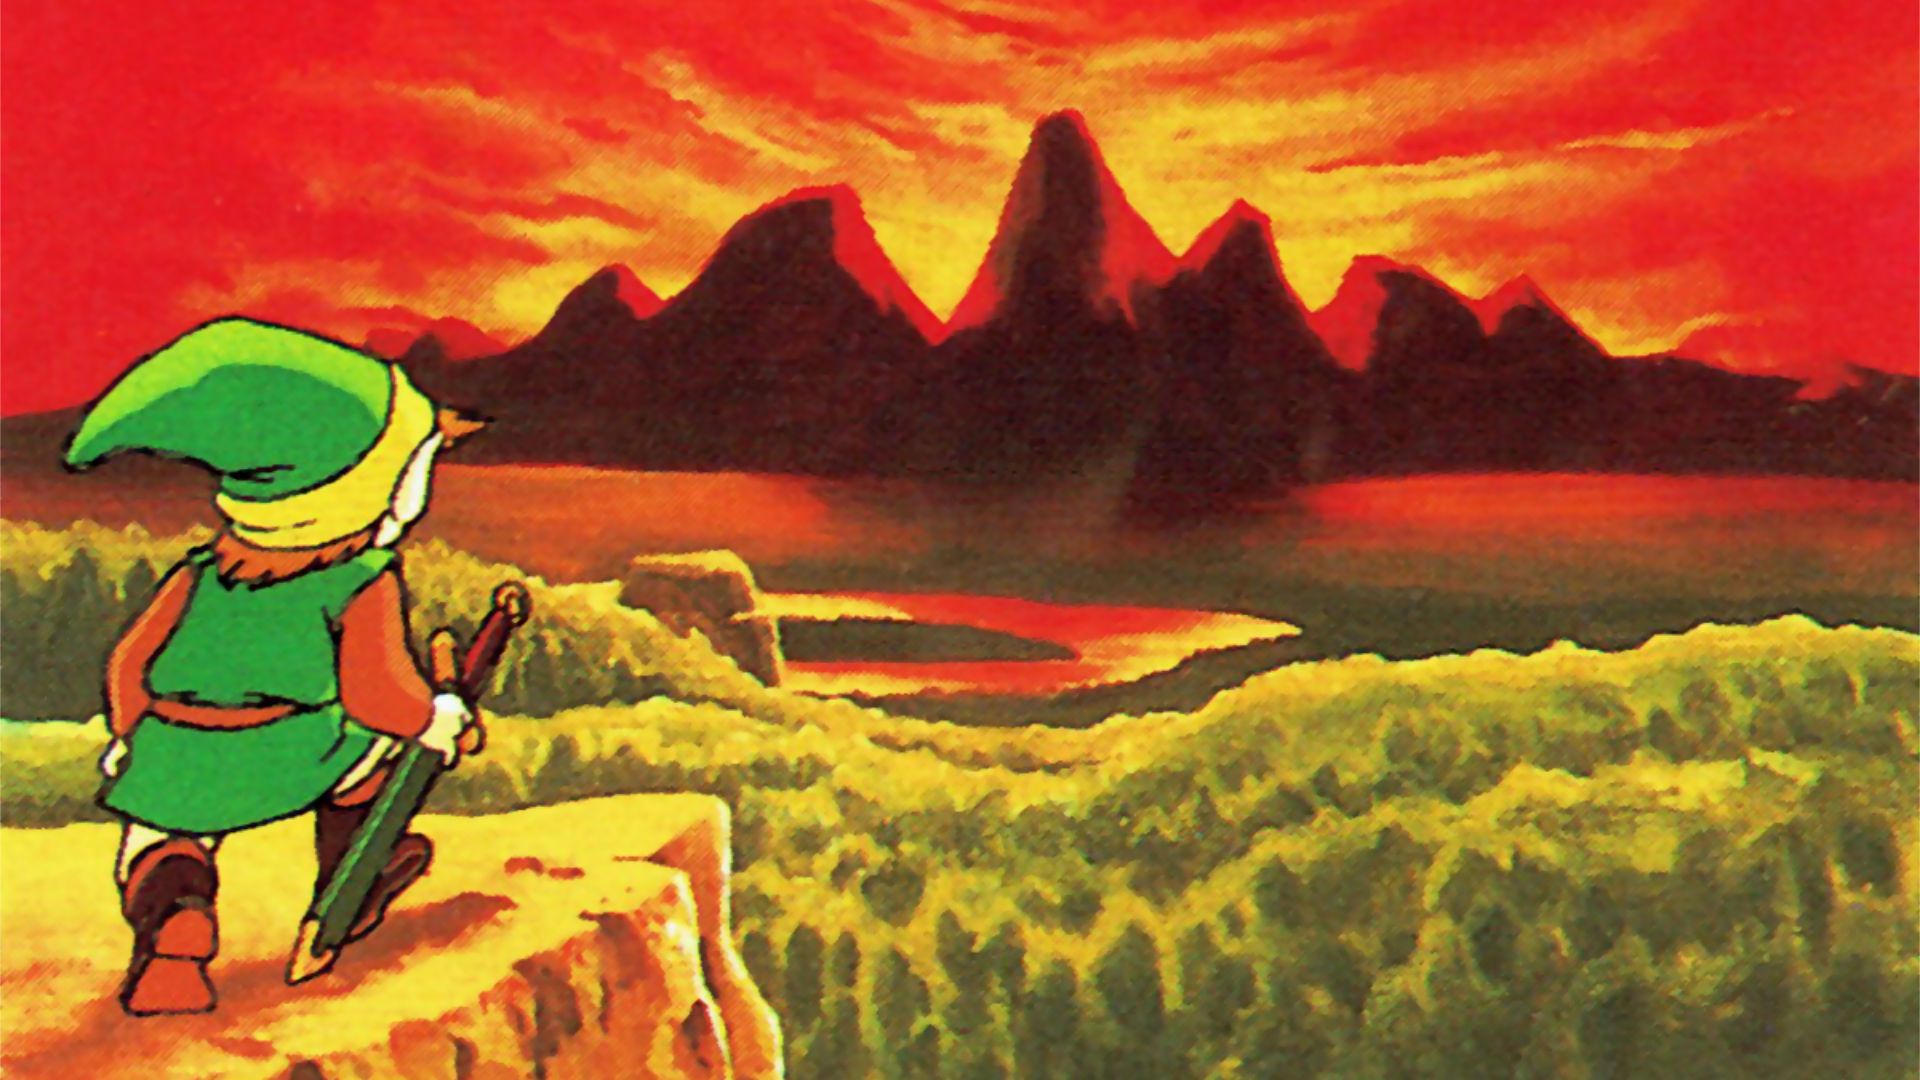 Flashback Friday Toronto 1989 - Original Legend of Zelda Artwork